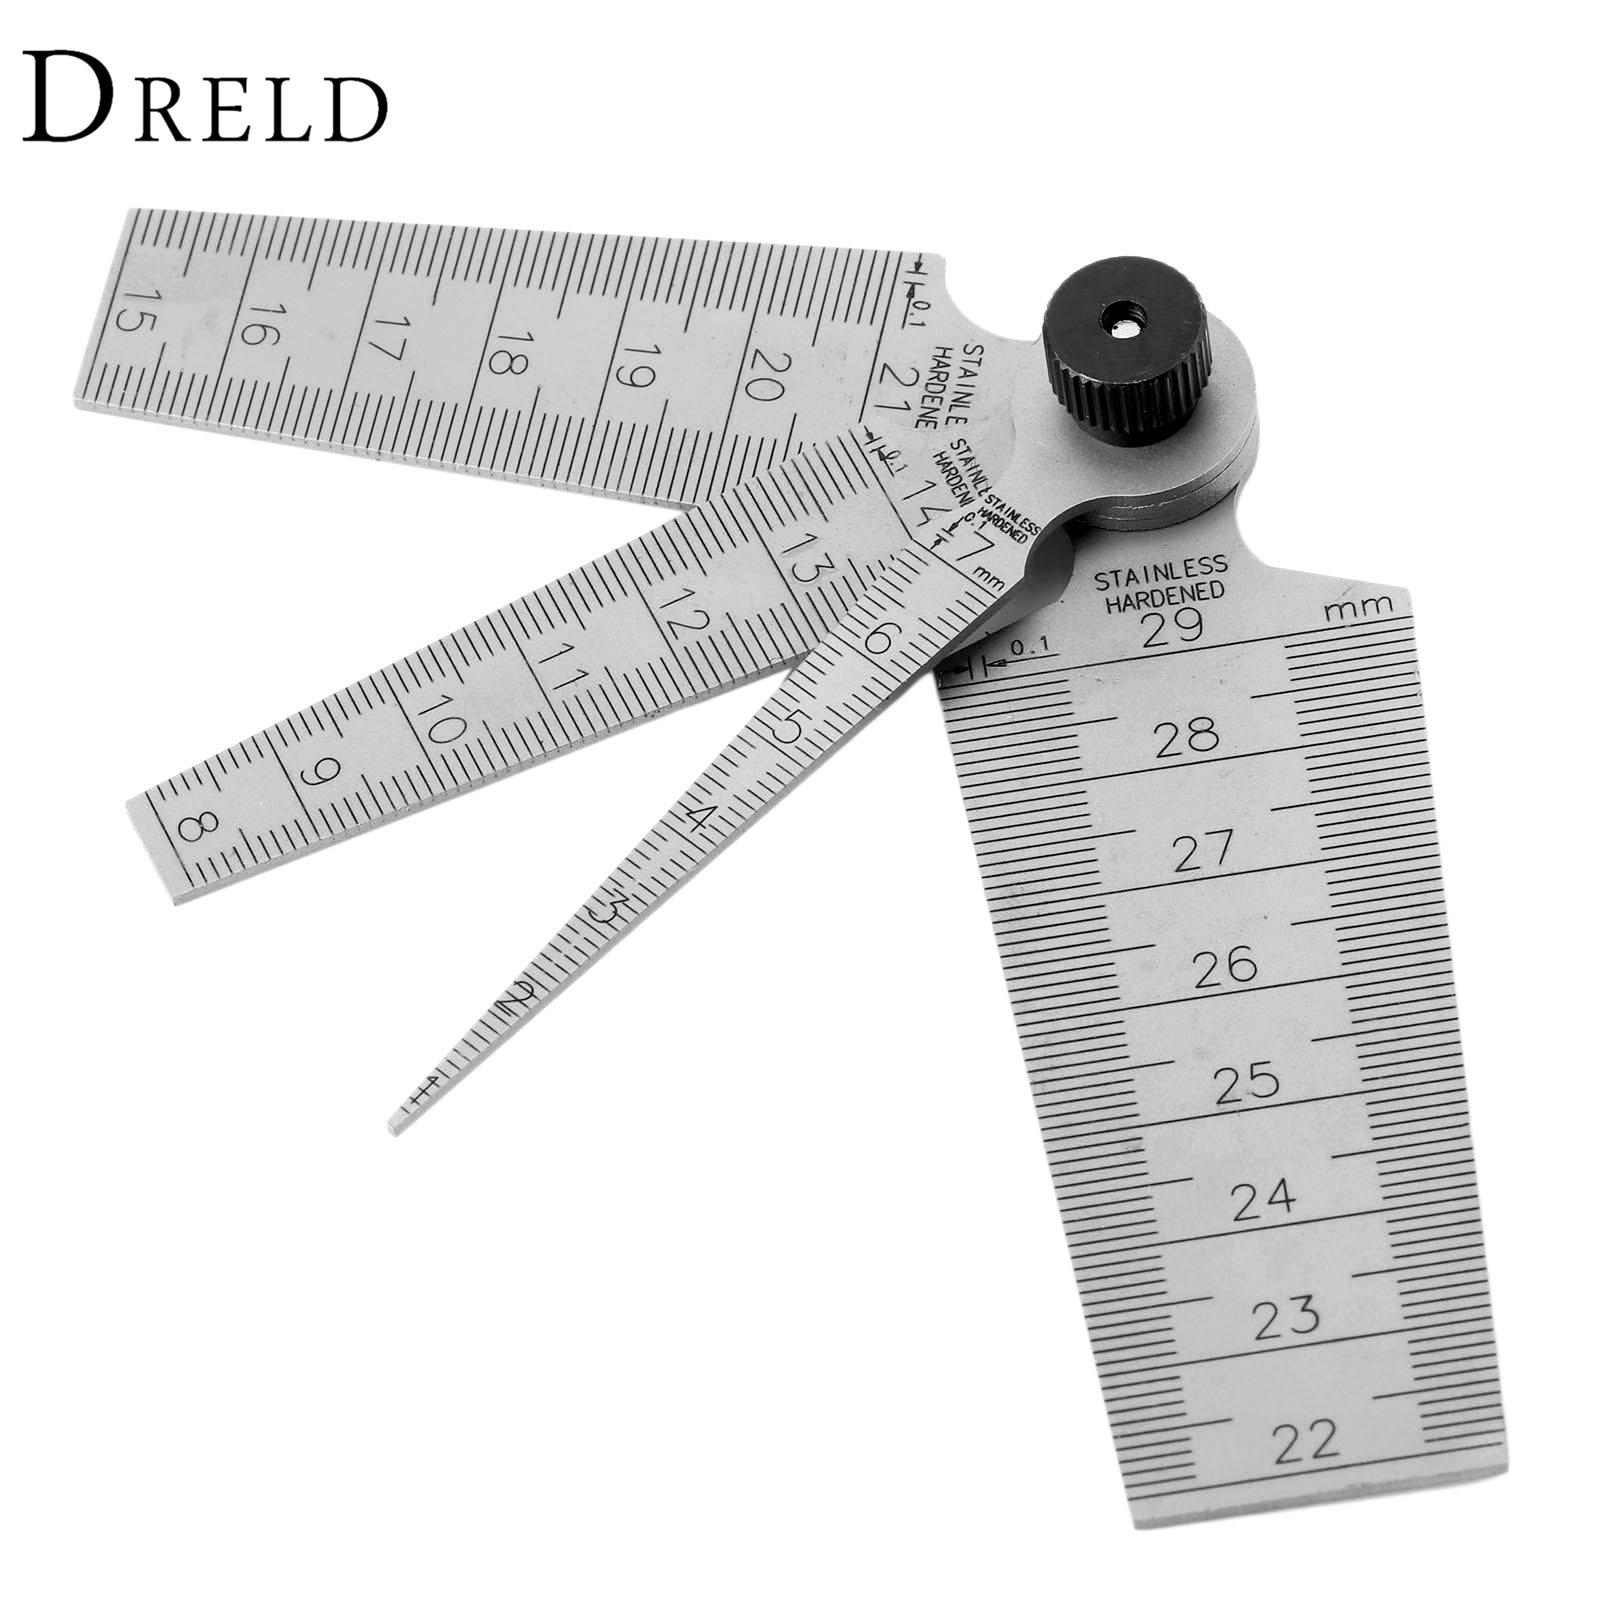 DRELD 0-29mm Steel Metric Taper Gauge Aperture Scale Wedge Feeler For Drill Hole 4 In 1 Muti-fuction Gap Ruler Measuring Tools